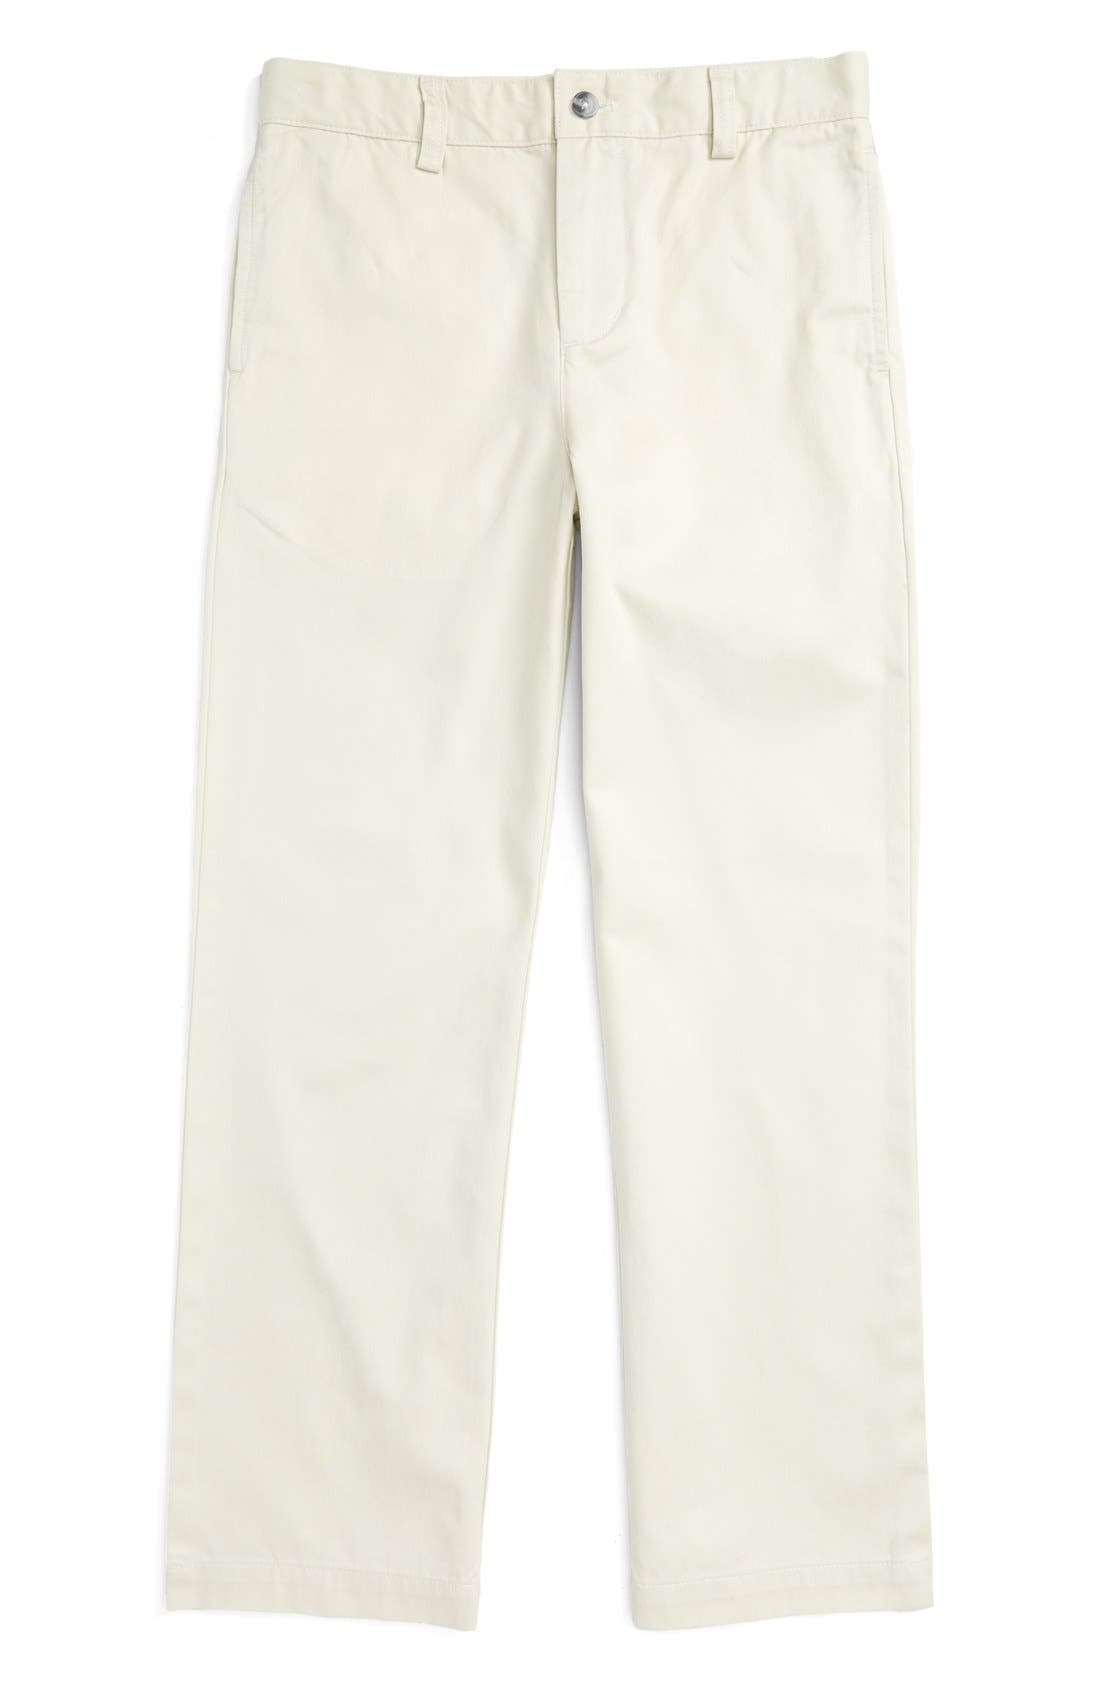 Club Cotton Twill Pants,                         Main,                         color, Stone